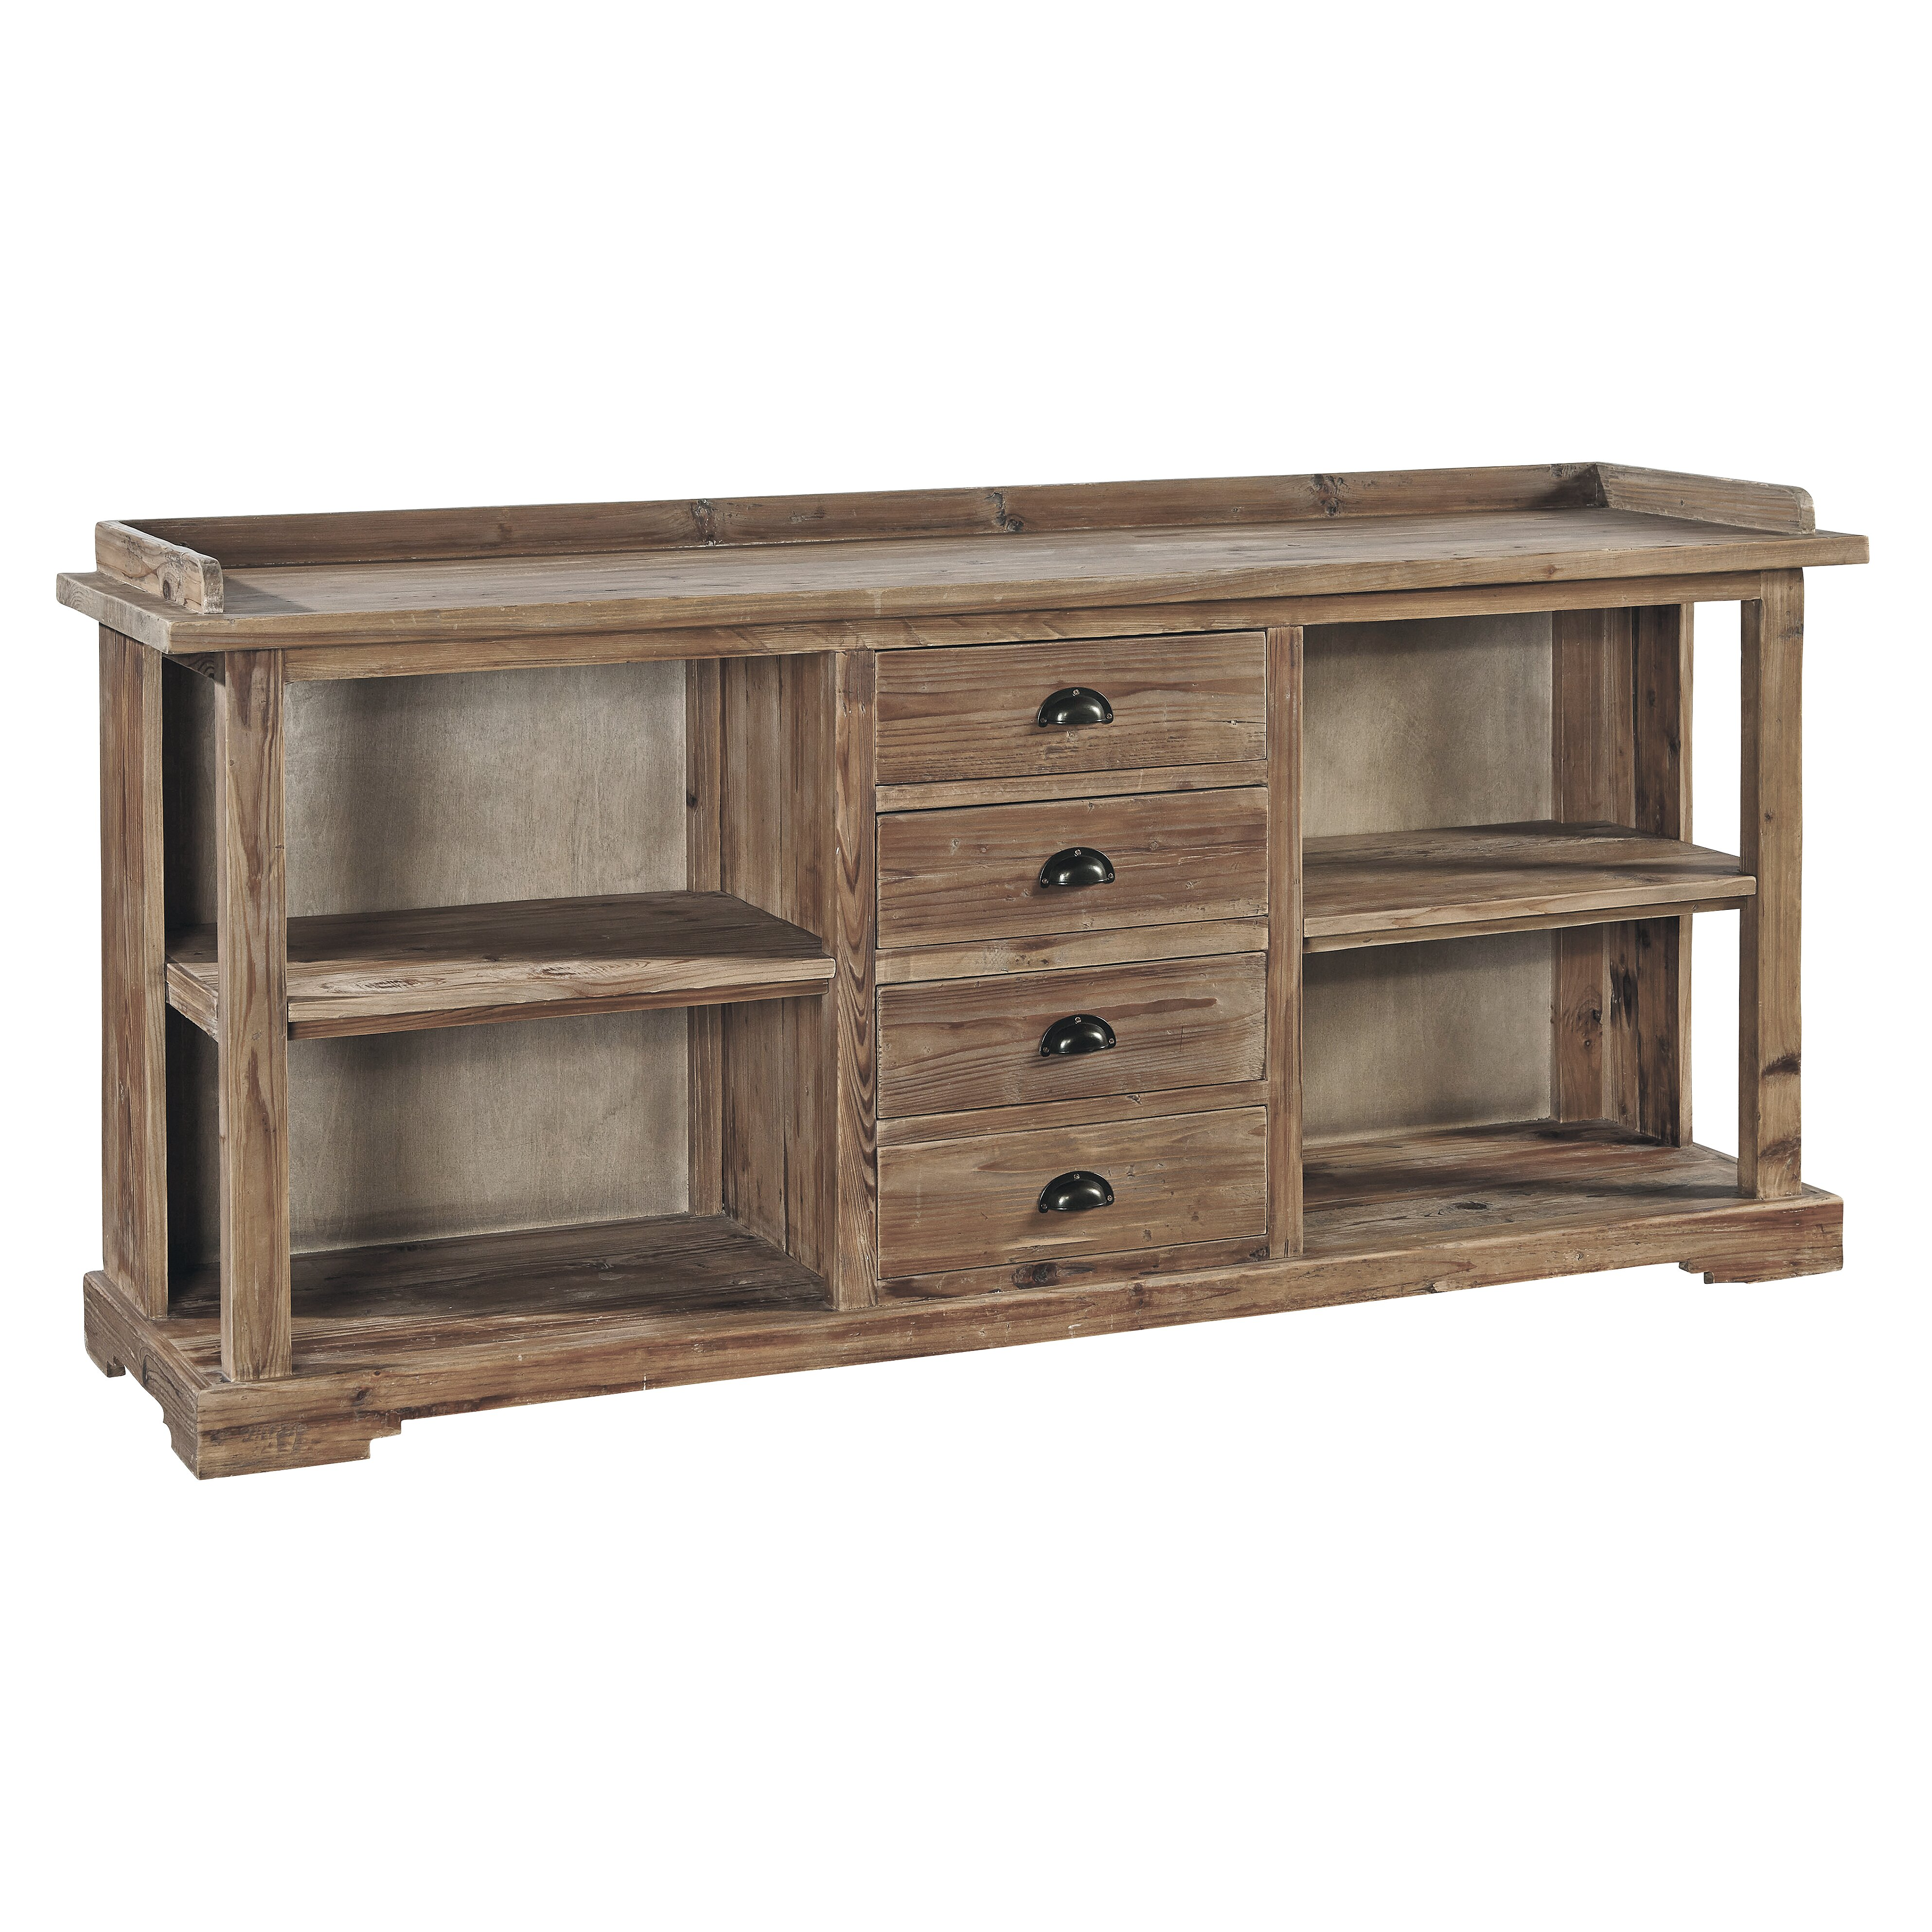 Furniture Classics LTD Old Fir Sideboard & Reviews  Wayfair